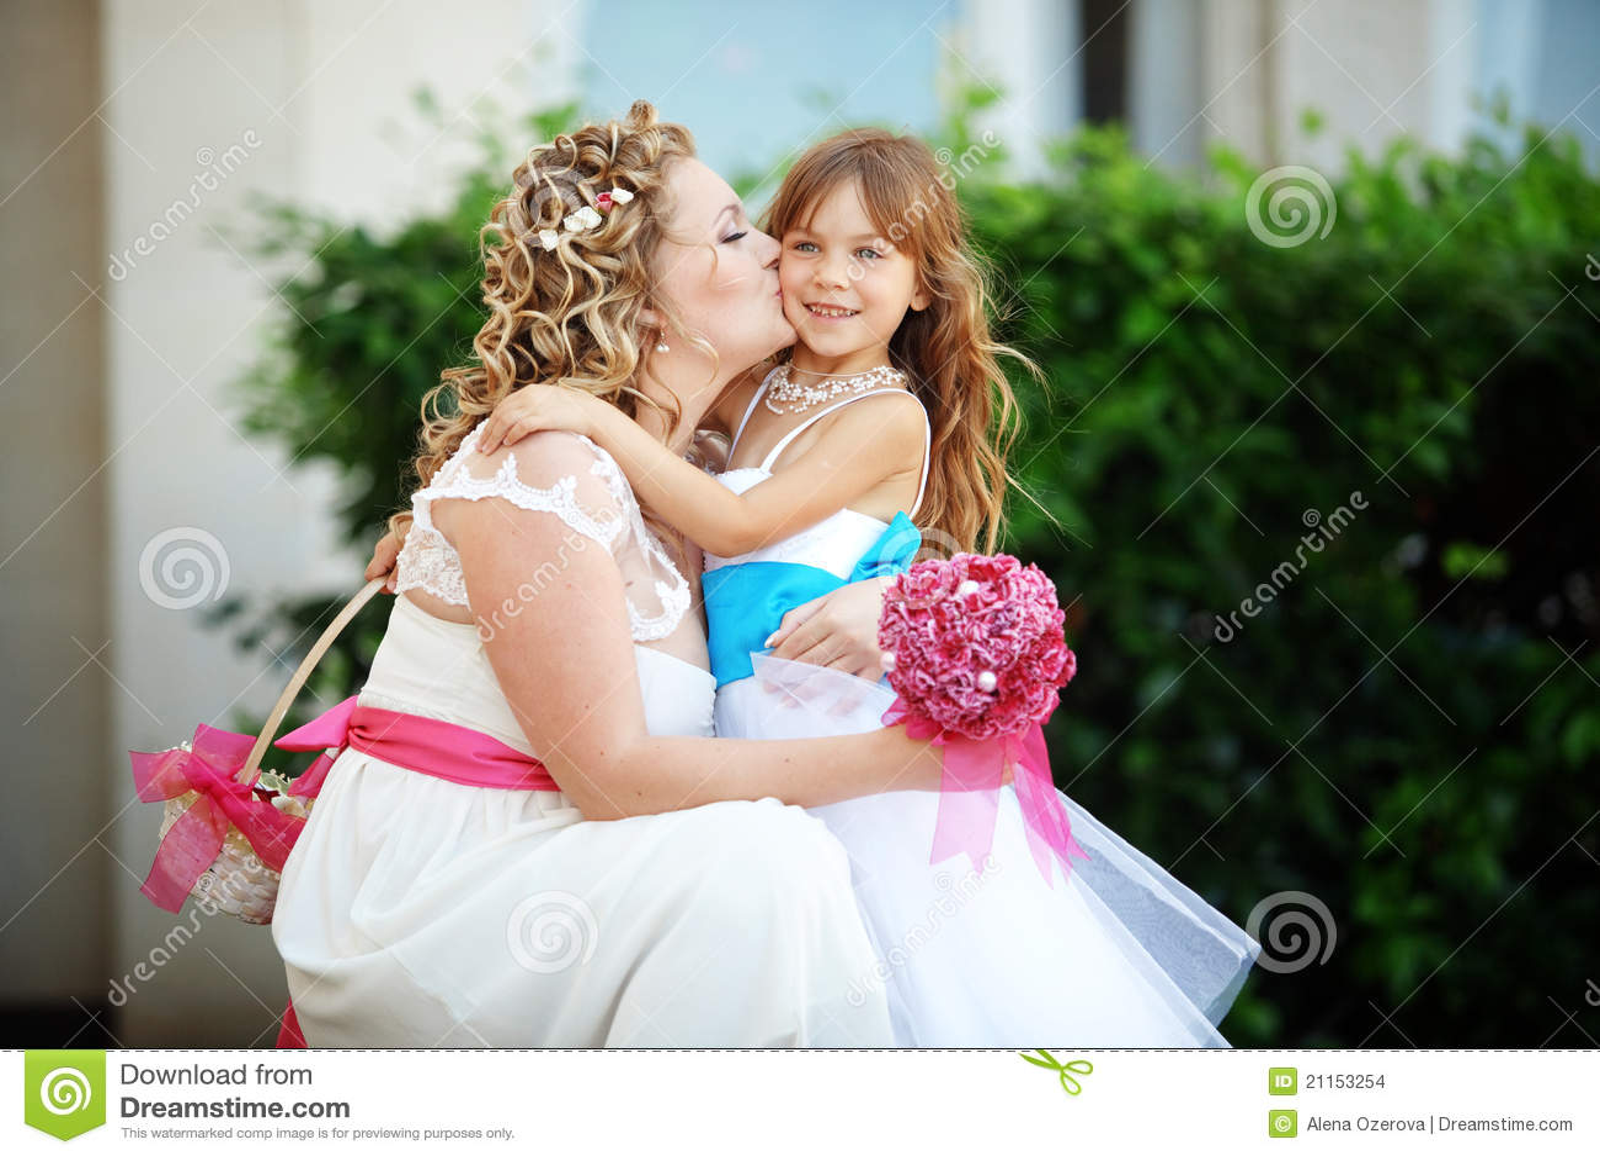 devki-na-svadbe